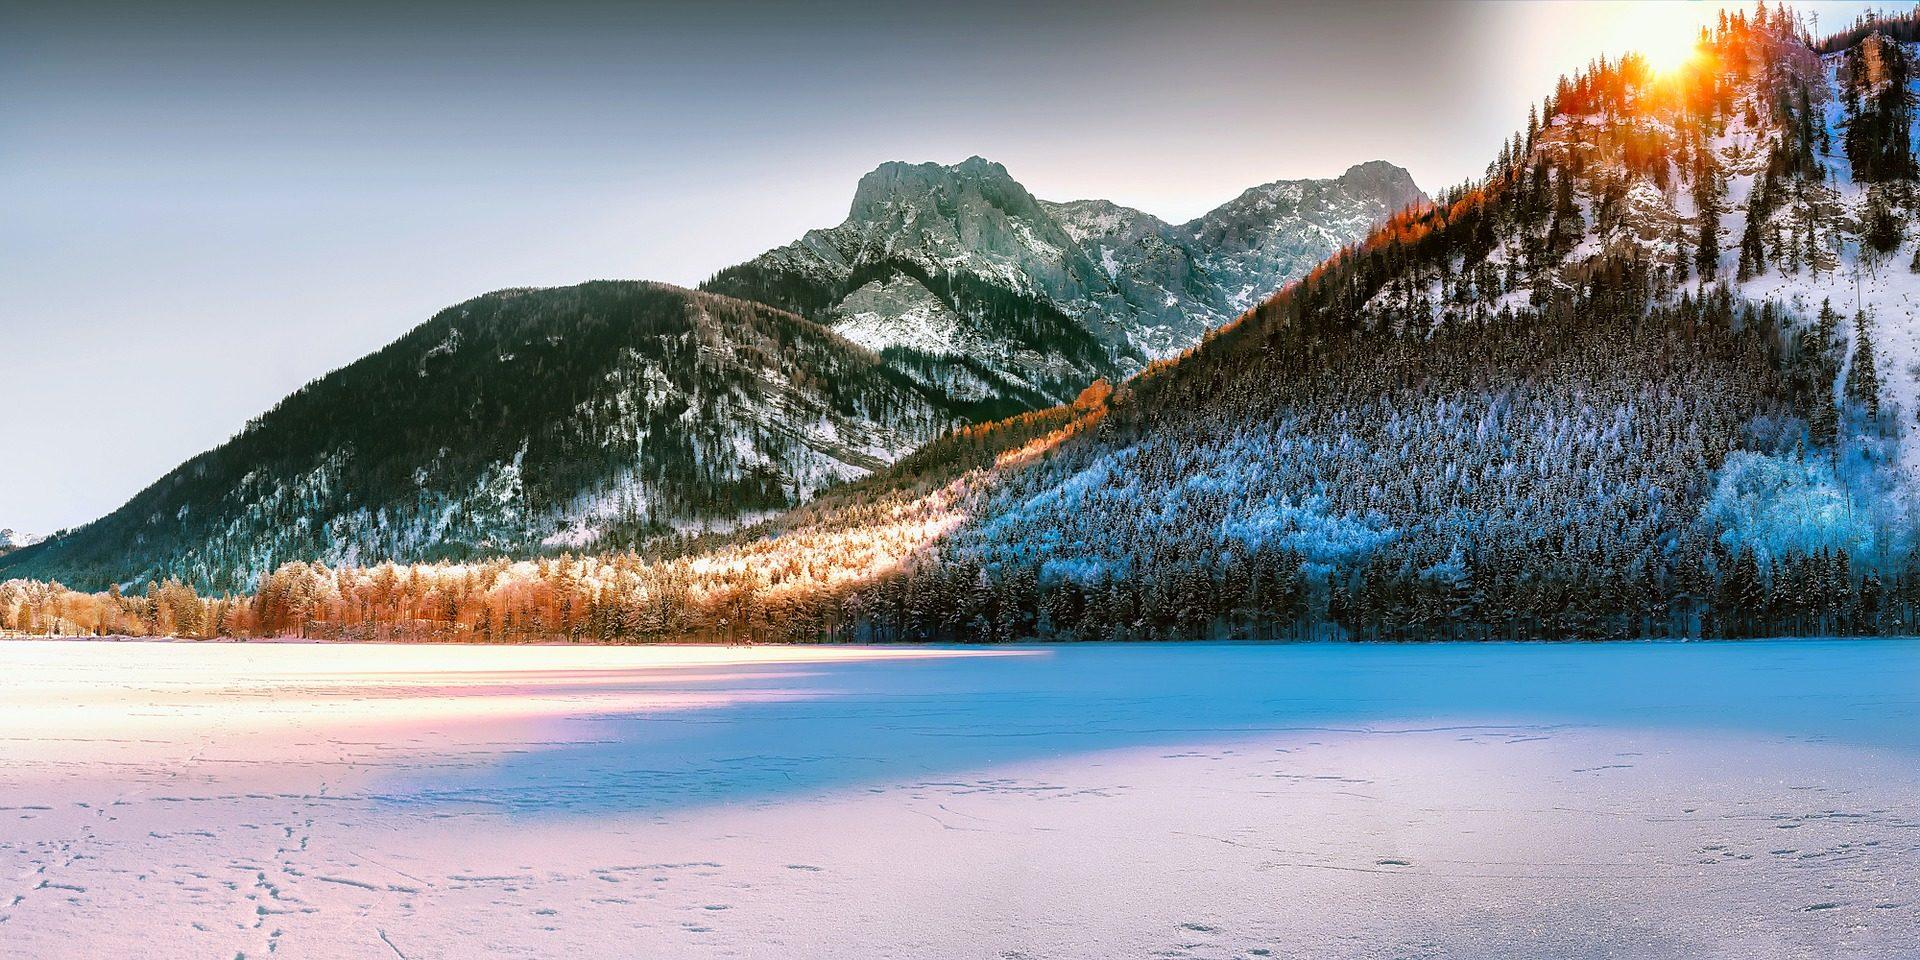 Montañas, बर्फबारी, बर्फ, डॉन द्वारा, झील, आइस क्रीम, सूर्य, किरणों - HD वॉलपेपर - प्रोफेसर-falken.com